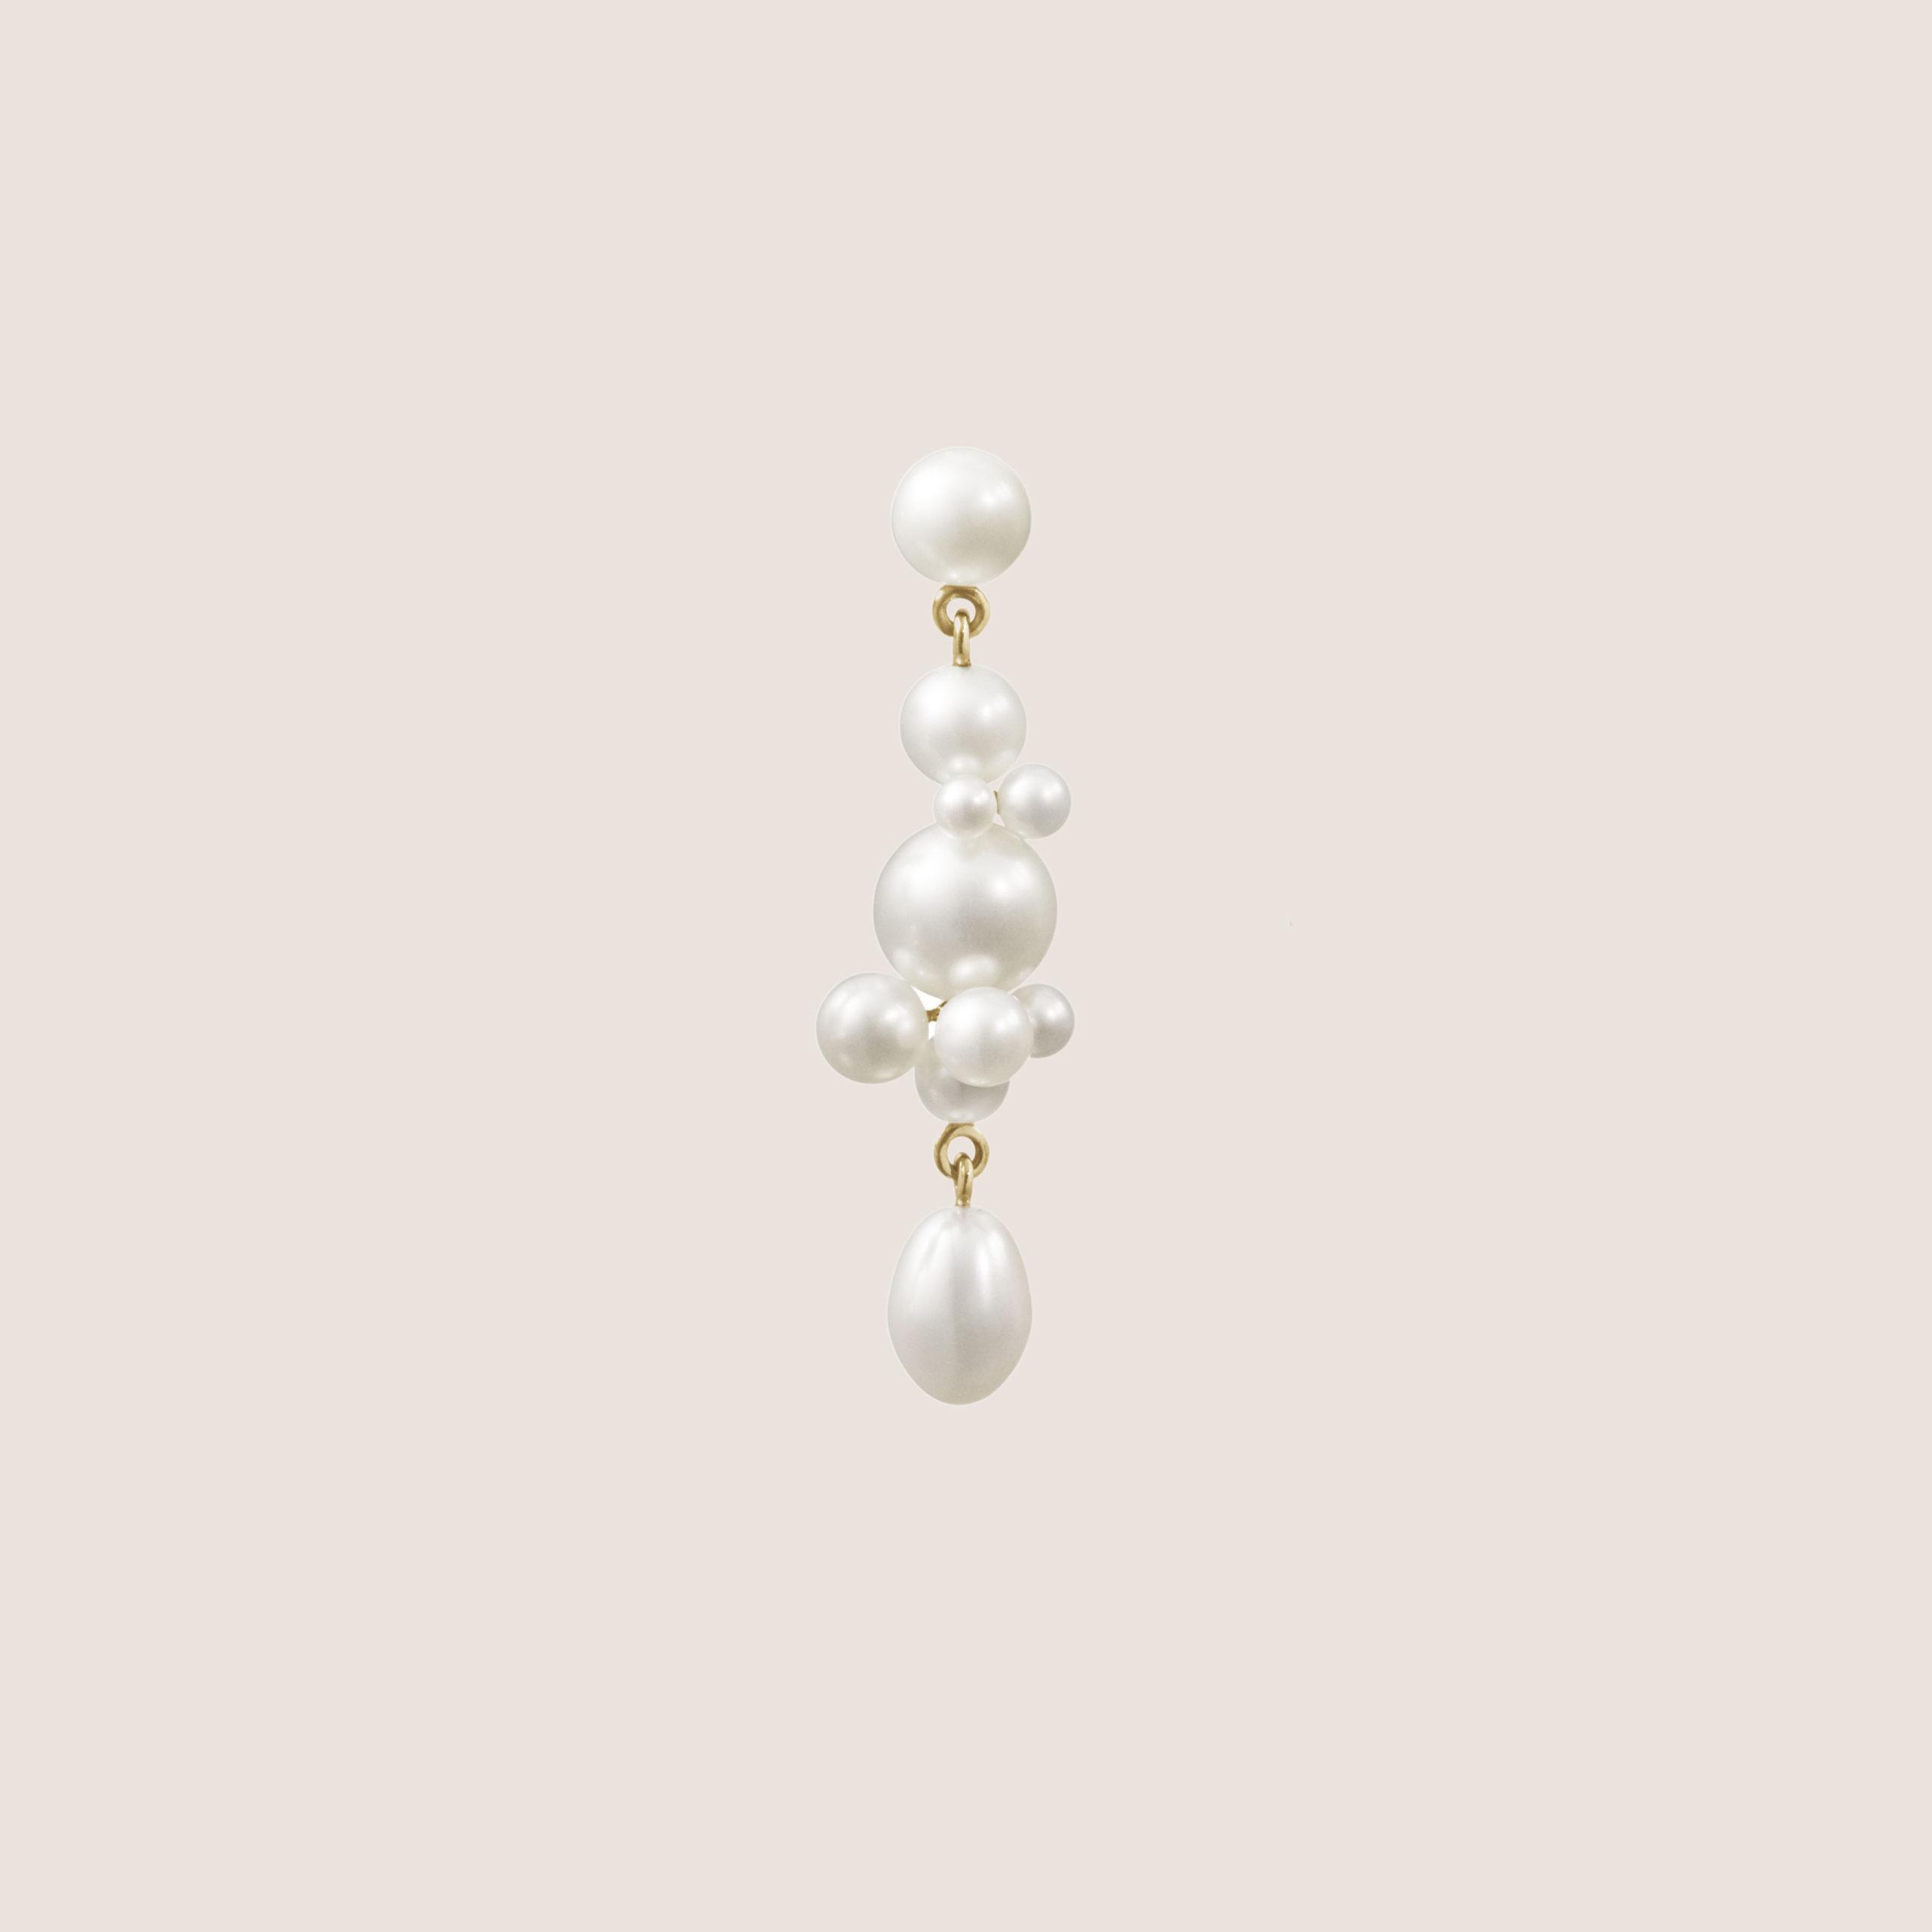 Petite Perle Splash Earring